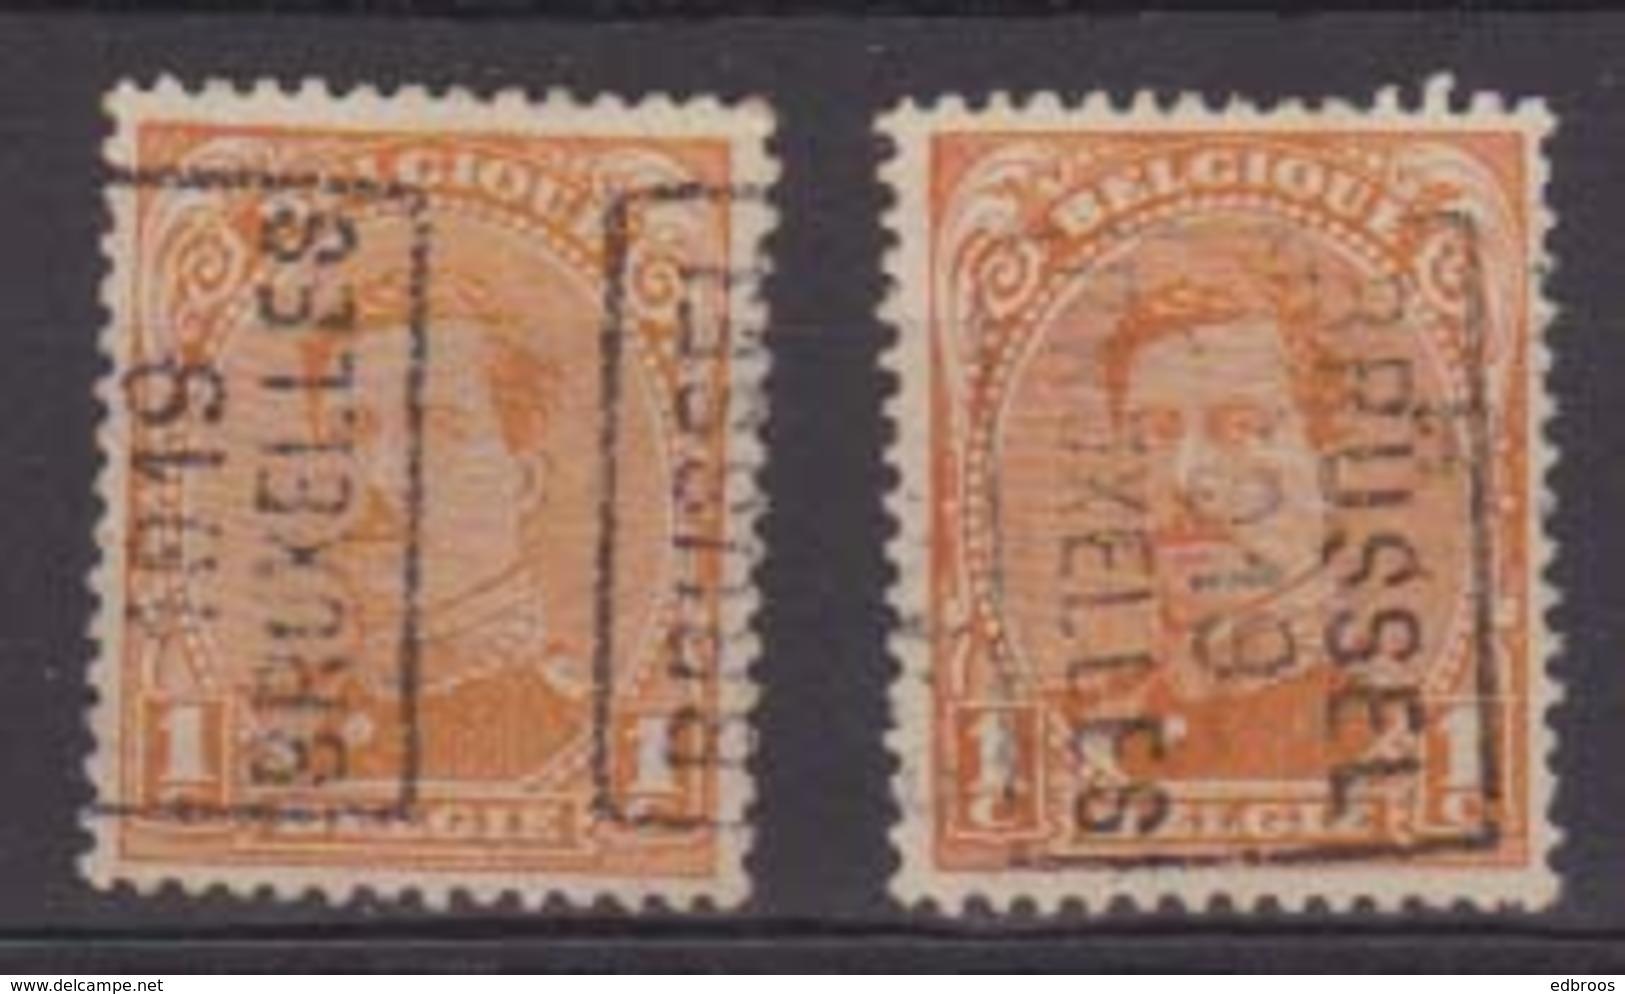 België/Belgique  Preo  Handrol/roulette N°2430 A+B Bussel/Bruxelles 1919 Type I. - Precancels